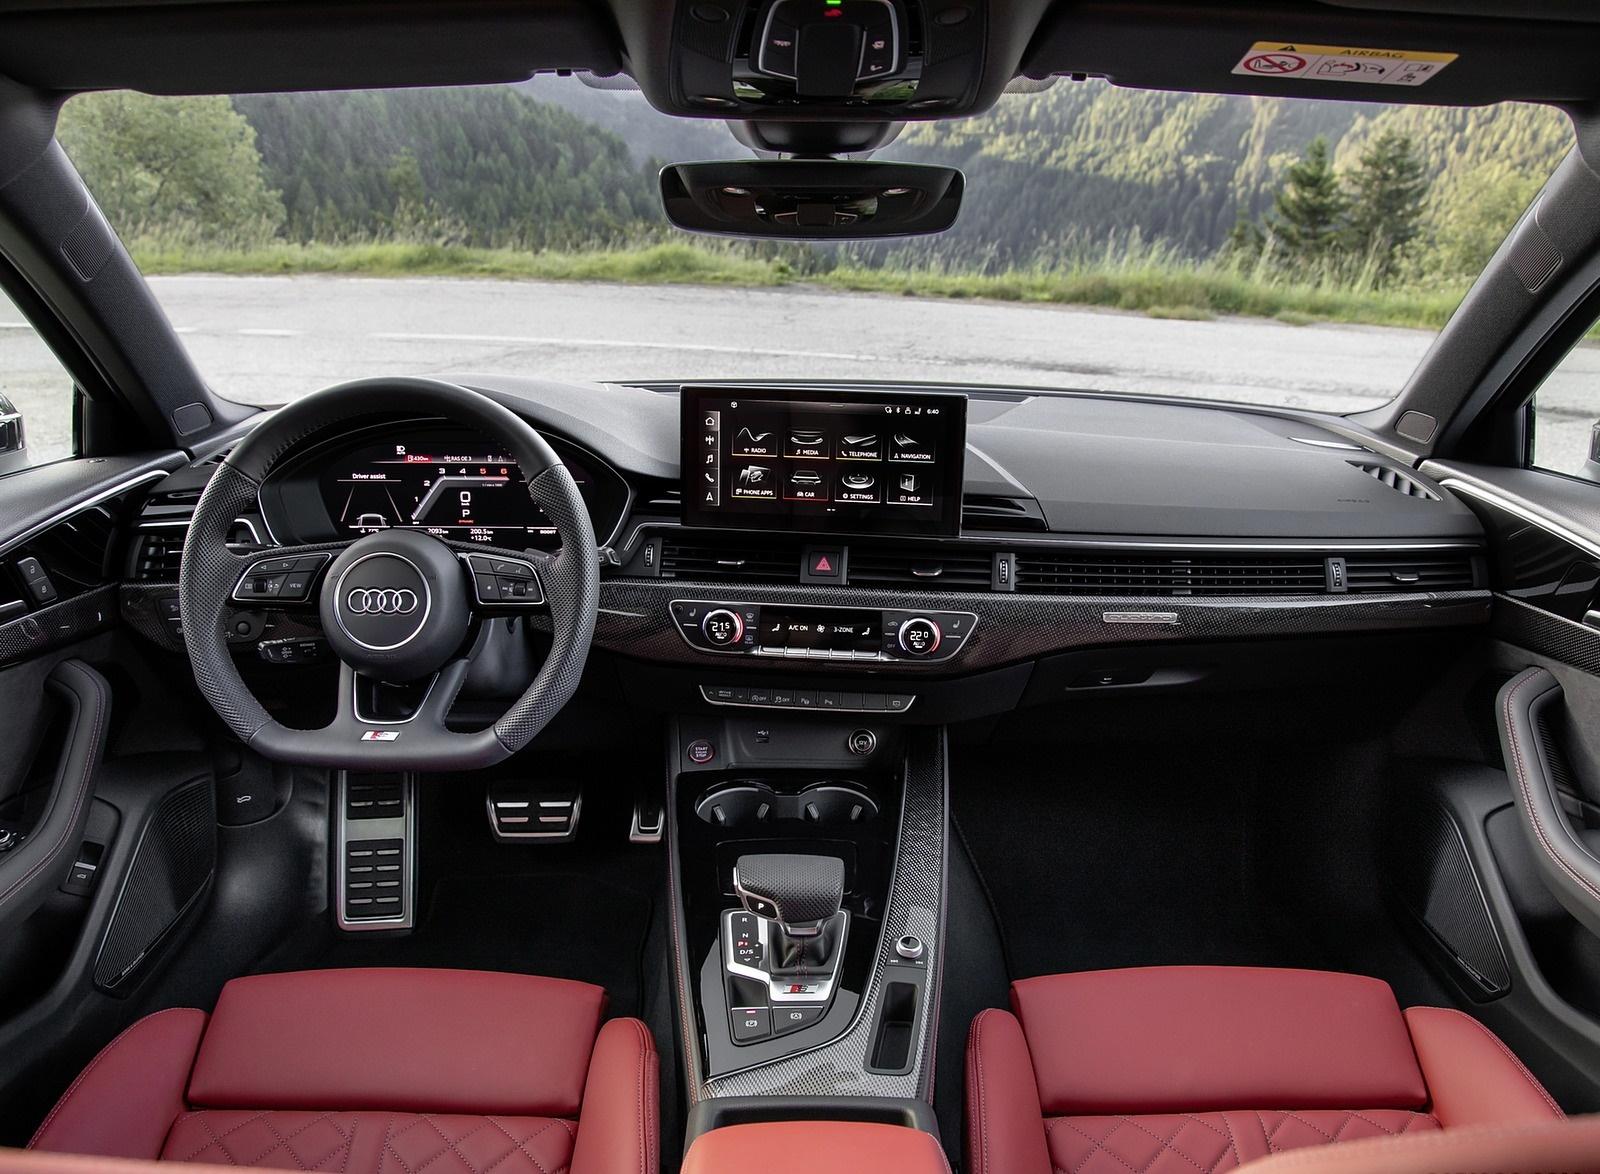 2019 Audi S4 Avant Tdi Interior